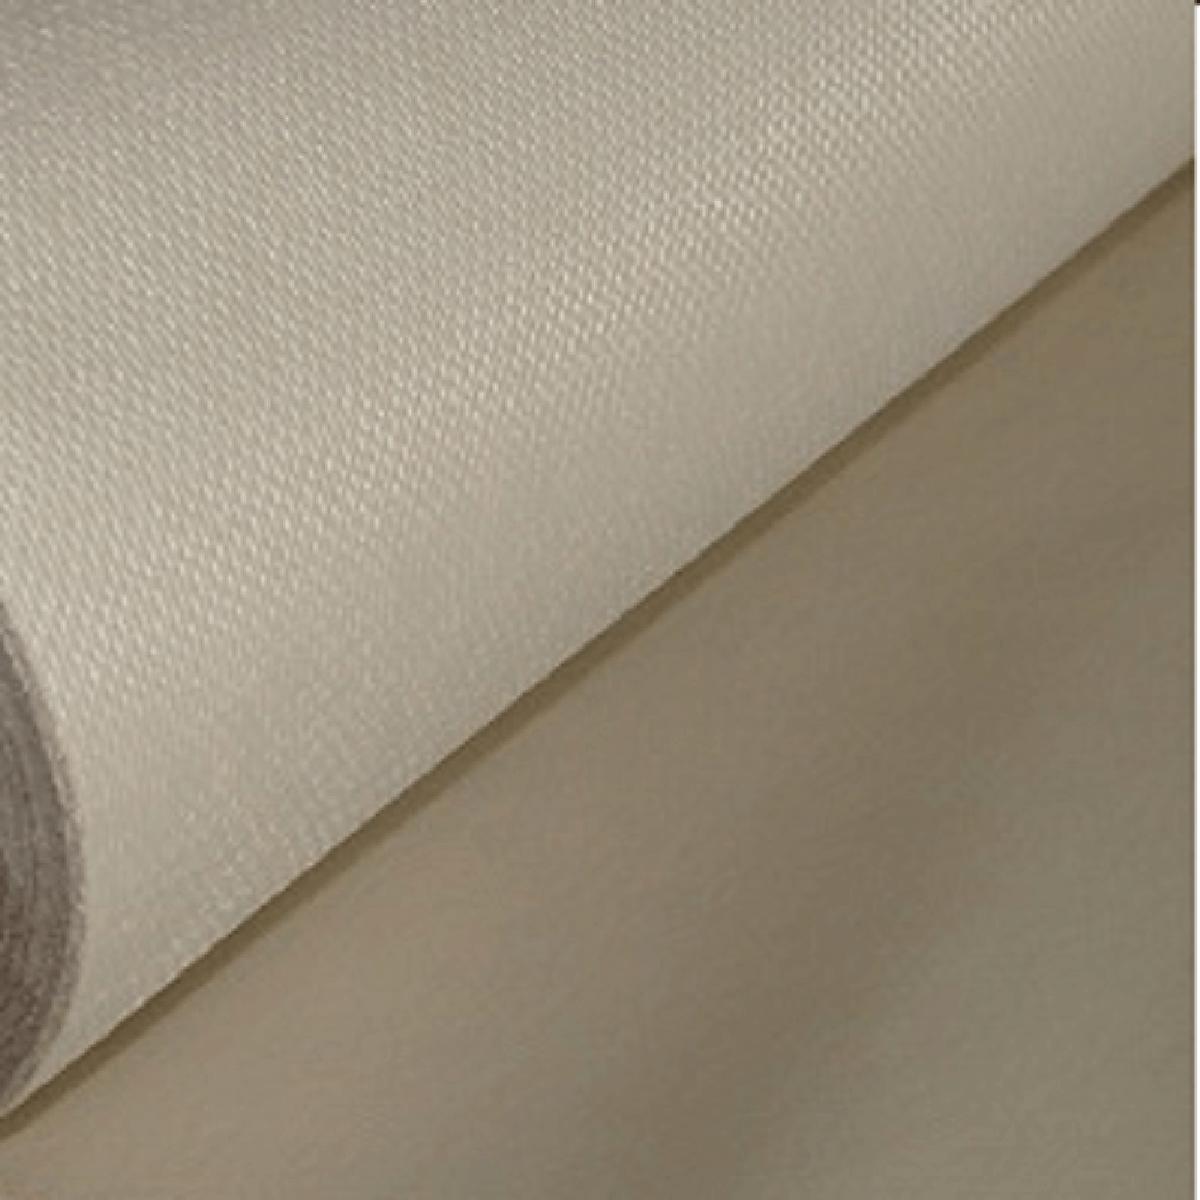 Kit 5m de Napa Bagum Impermeável Div. Cores /METRO  - CarroCasa